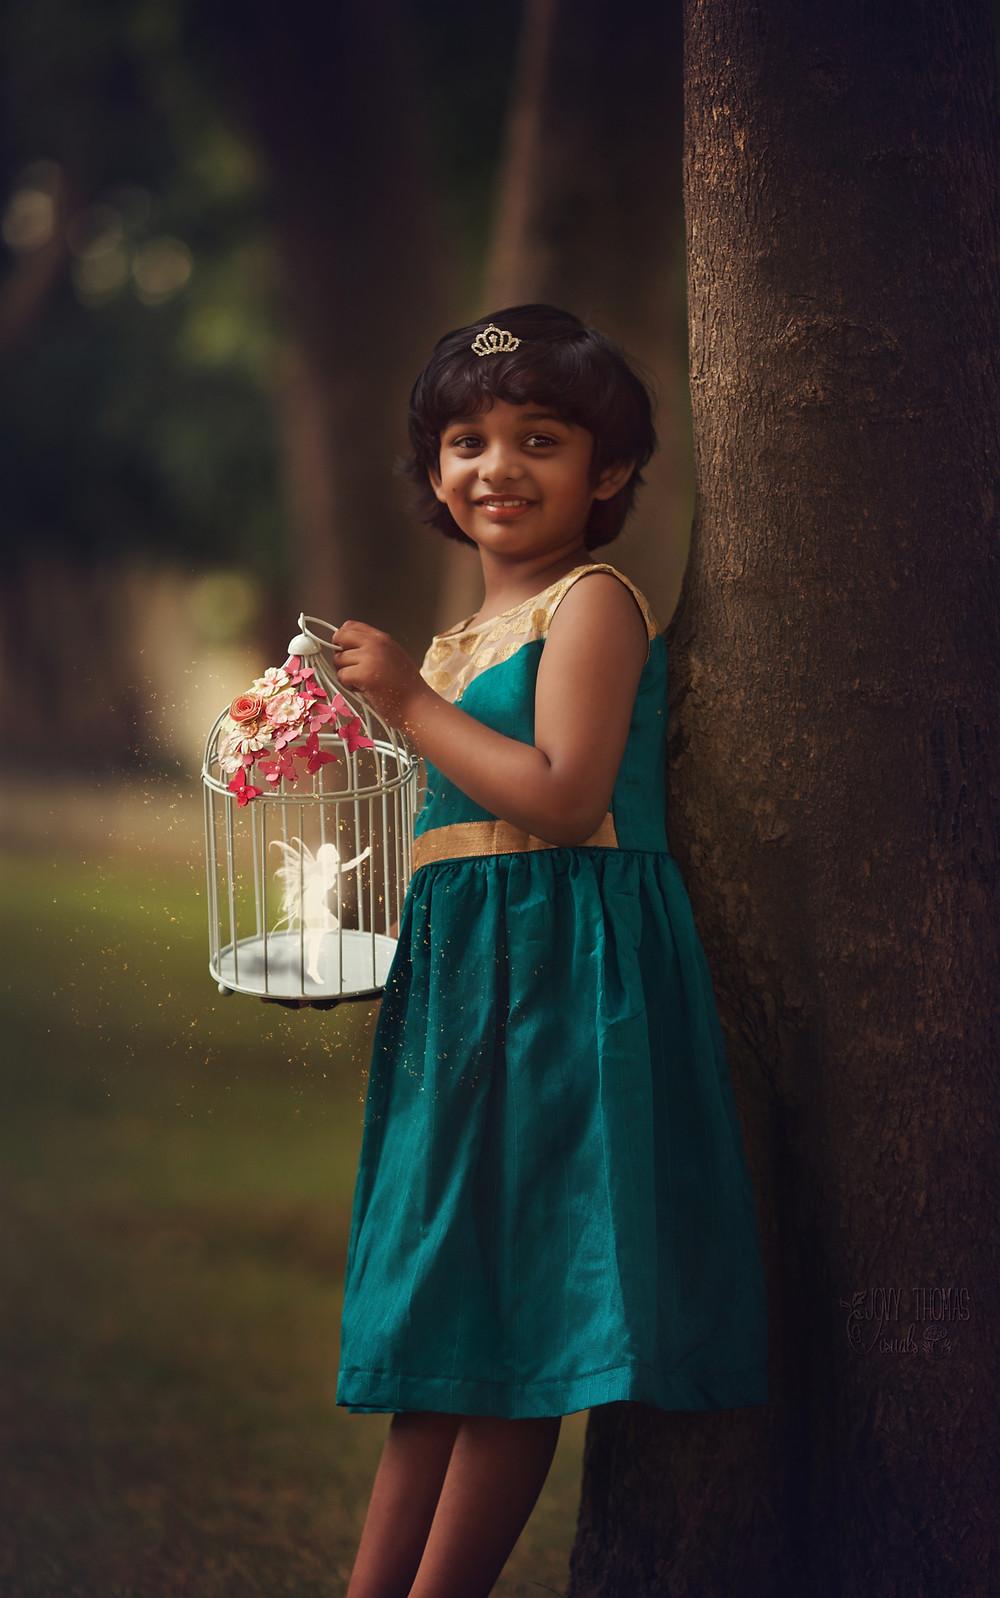 Best child photographer India